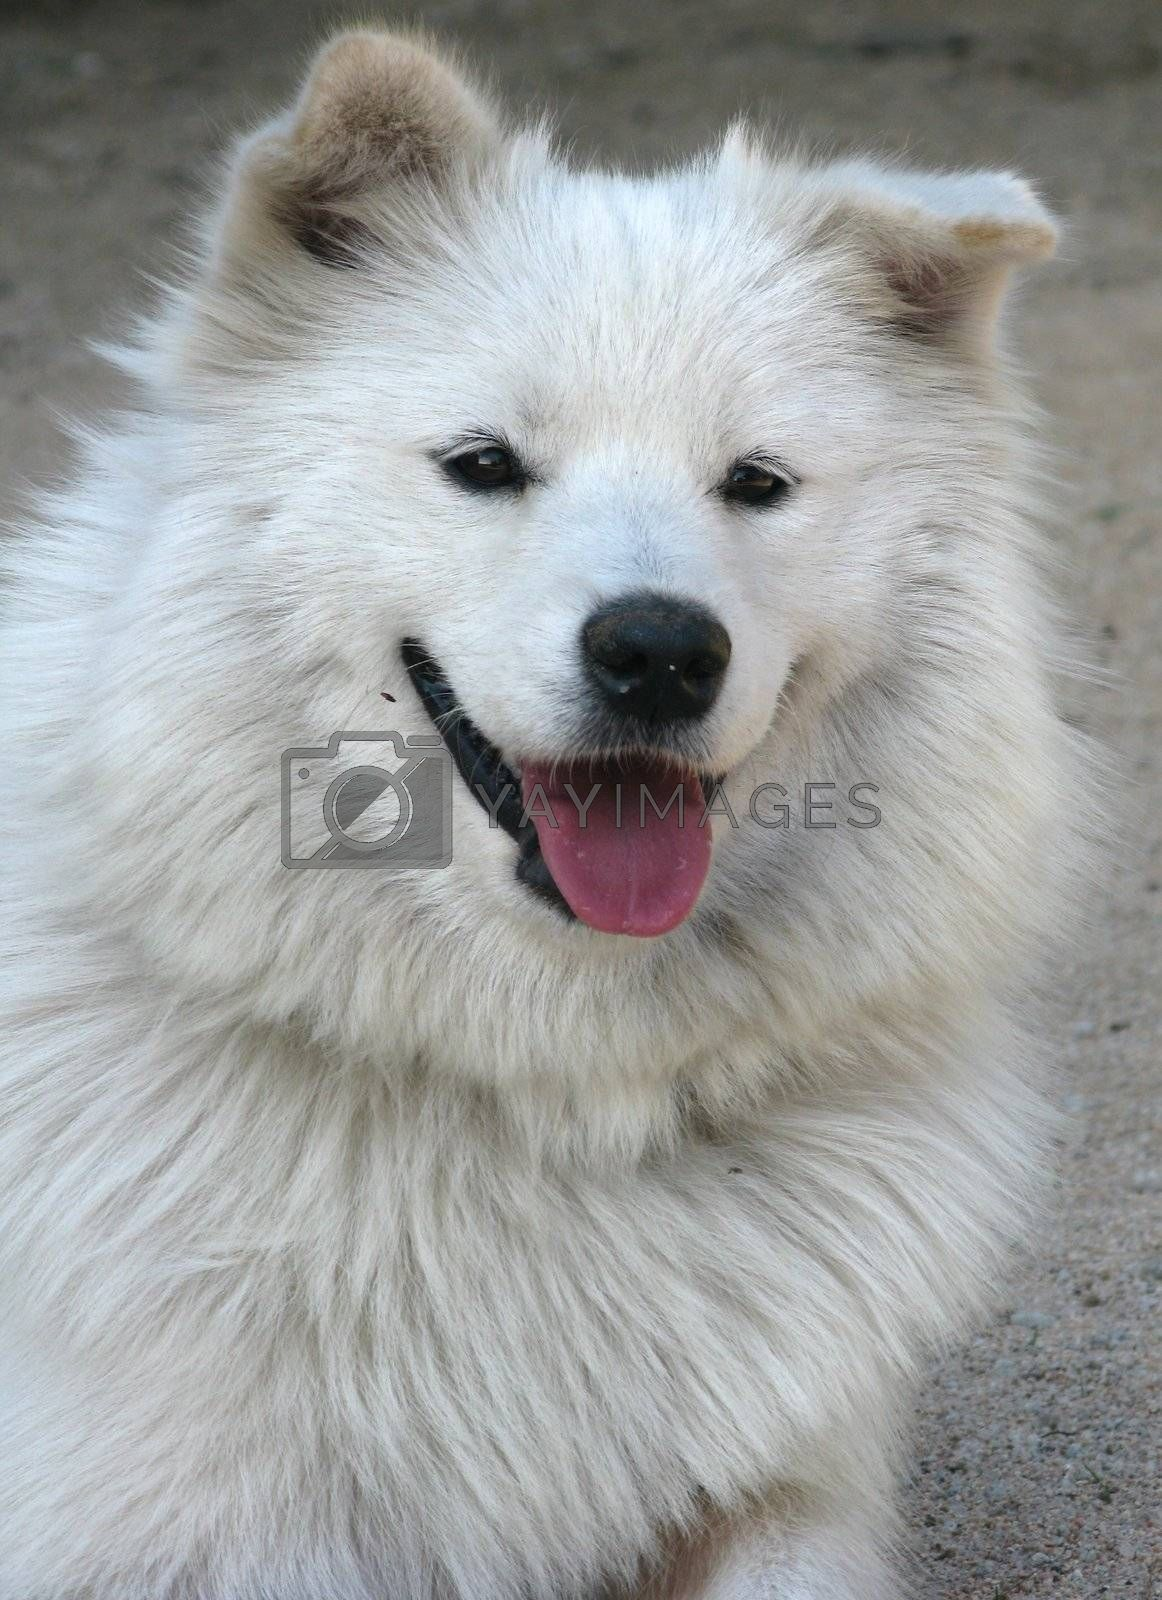 Samoyed dog by olgaolga